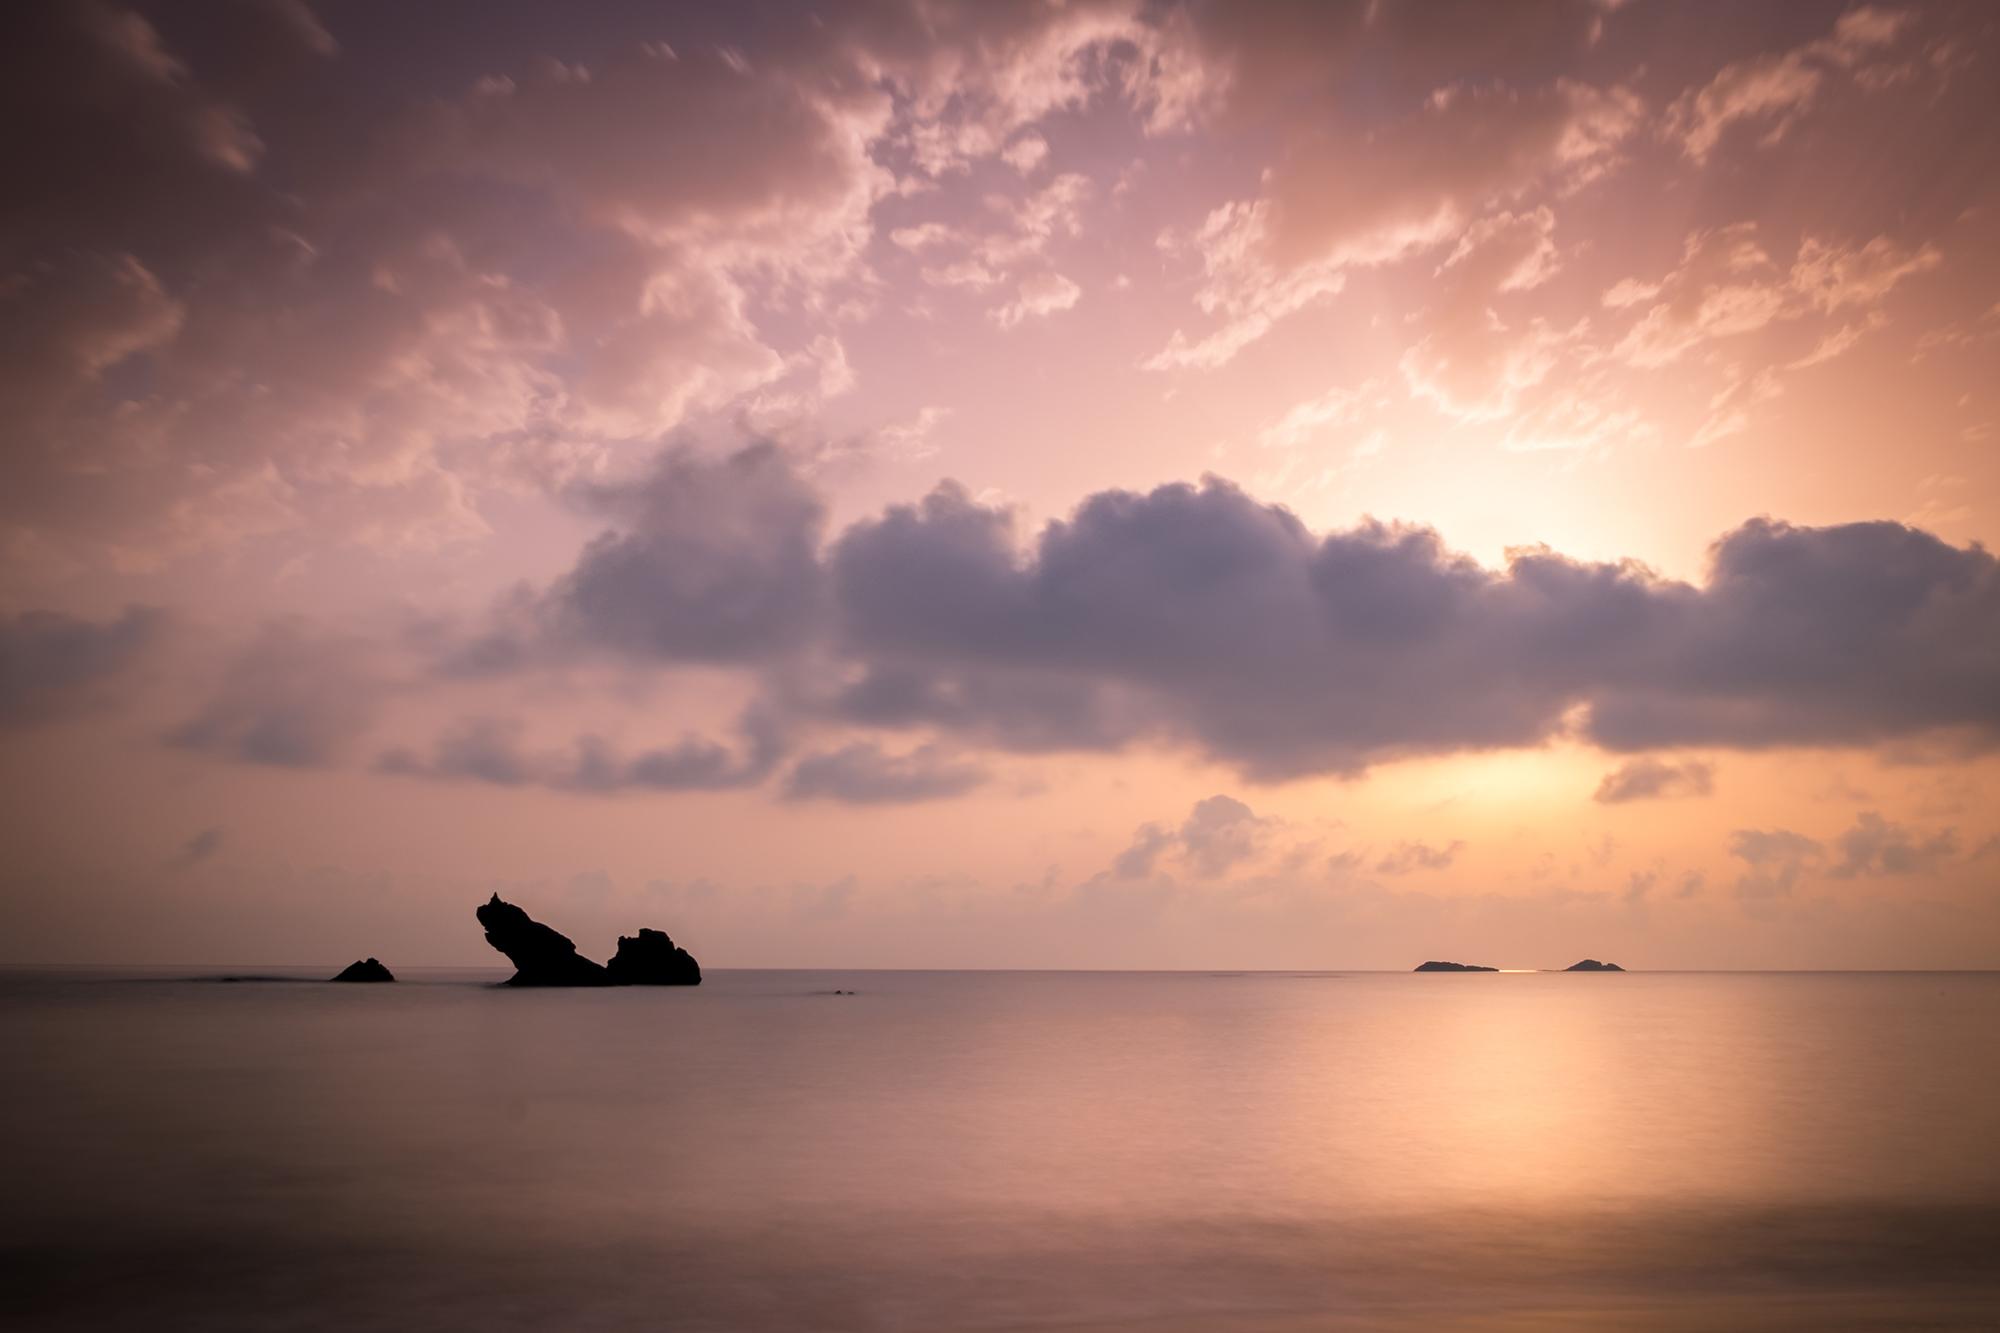 160829 - Ibiza - Sunrise - Es Figueral 001.jpg